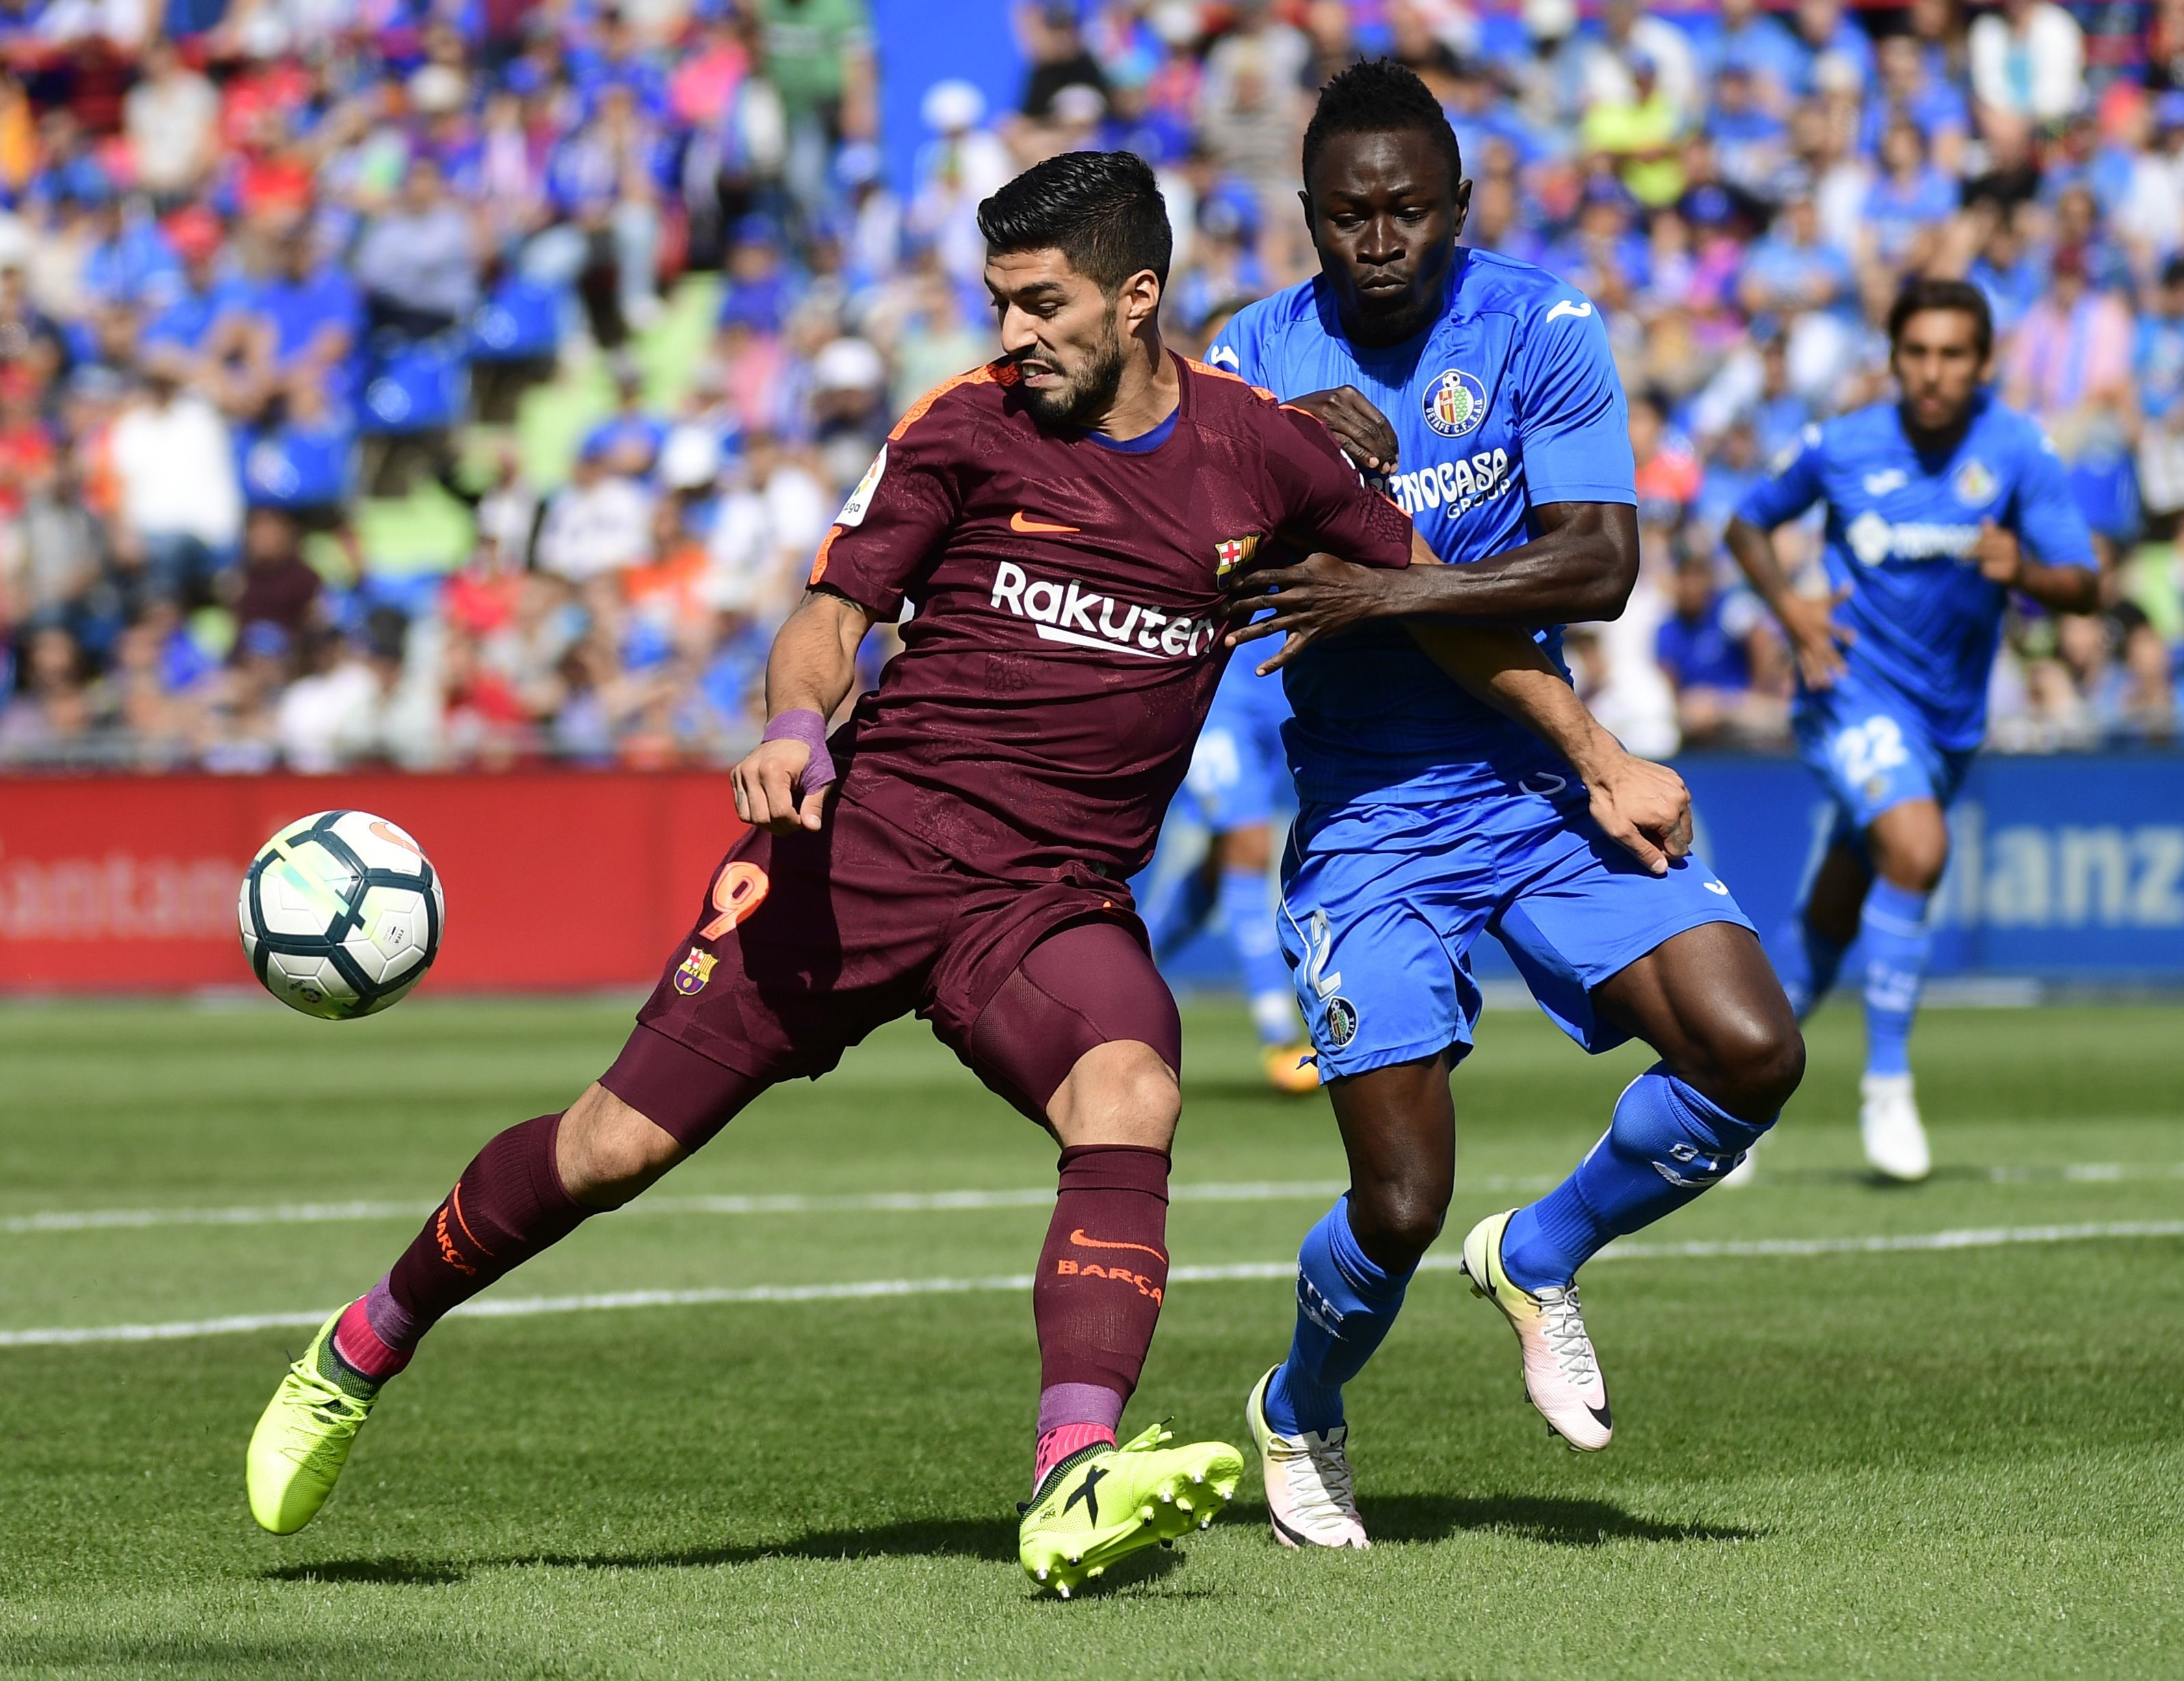 Barcelona's Luis Suarez takes on Dakonam Djene of Getafe